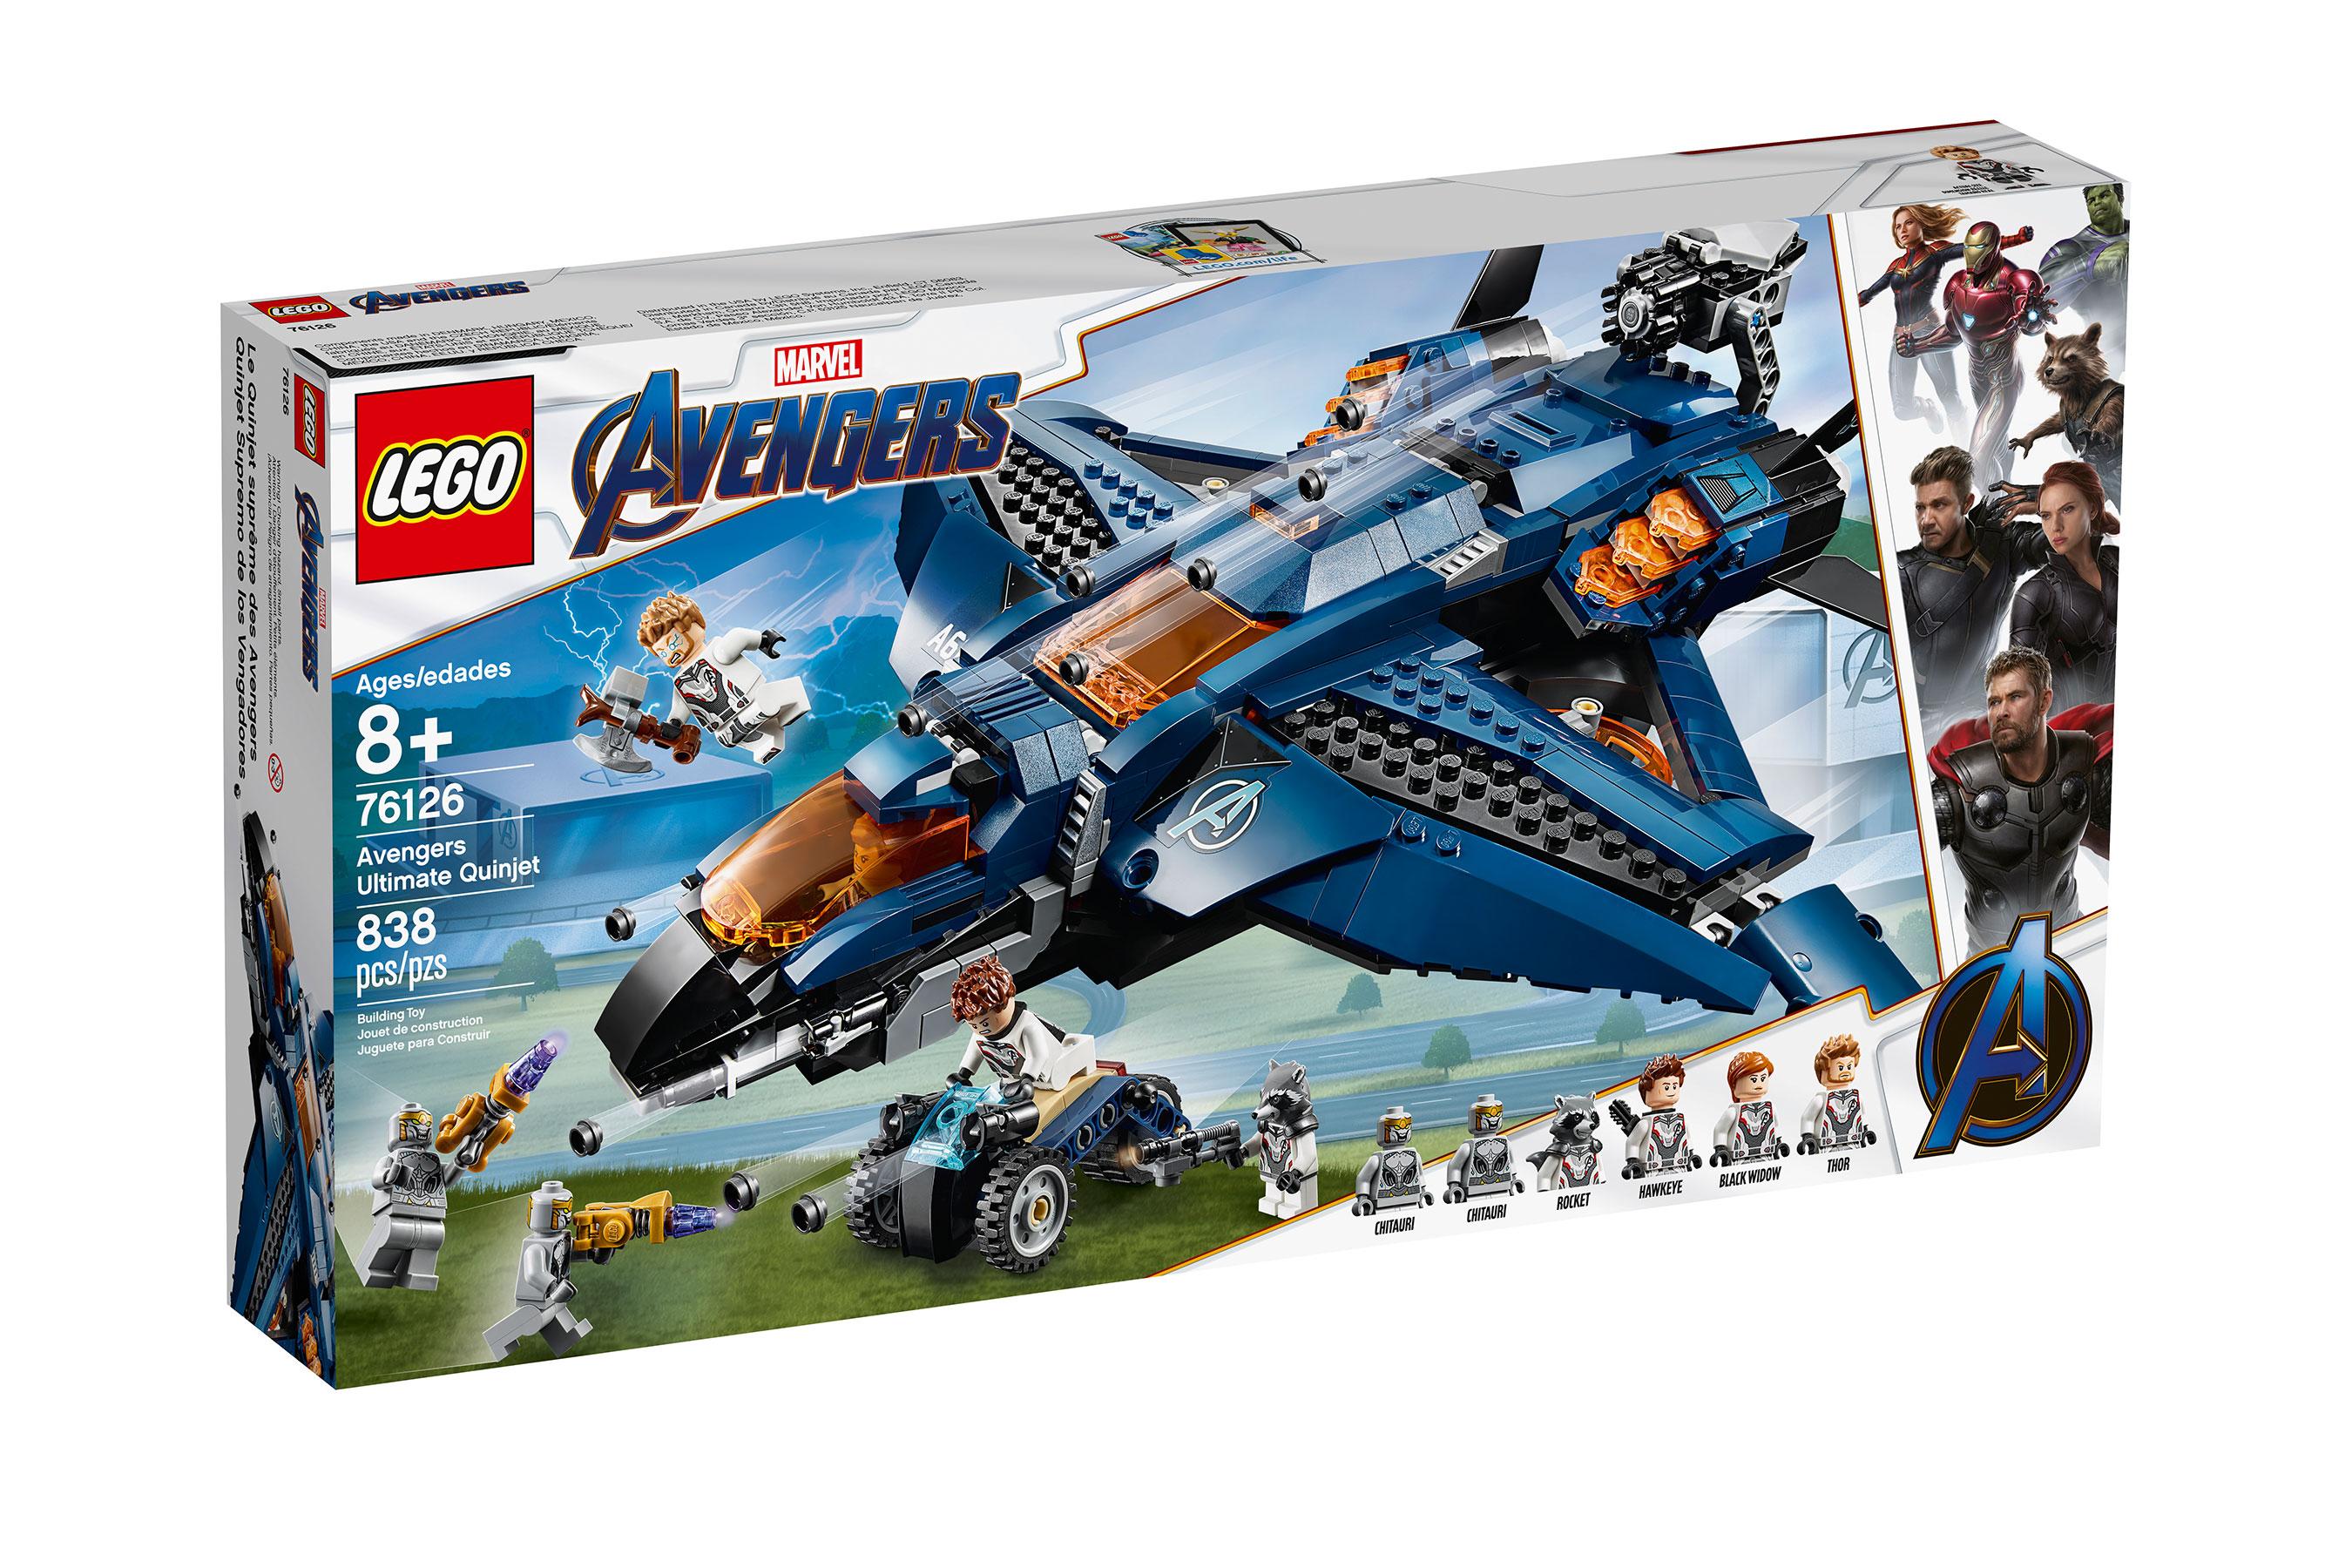 Avengers: Endgame LEGO Sets Revealed | Cosmic Book News